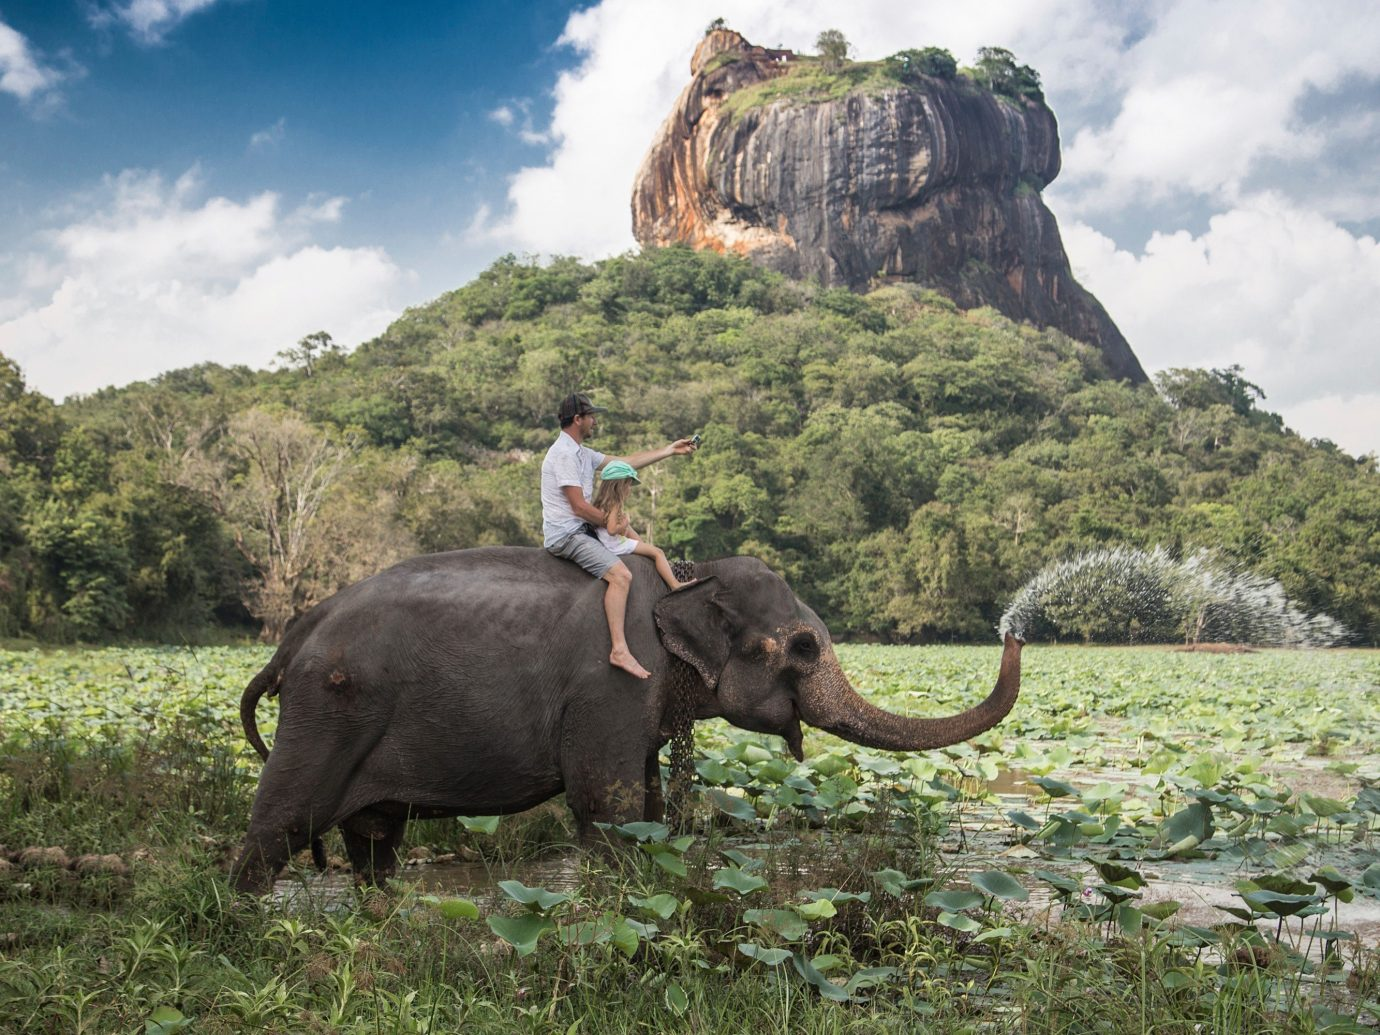 Trip Ideas outdoor grass sky indian elephant elephant animal mammal elephants and mammoths field fauna Wildlife Adventure Safari mahout savanna Jungle cattle like mammal bovine